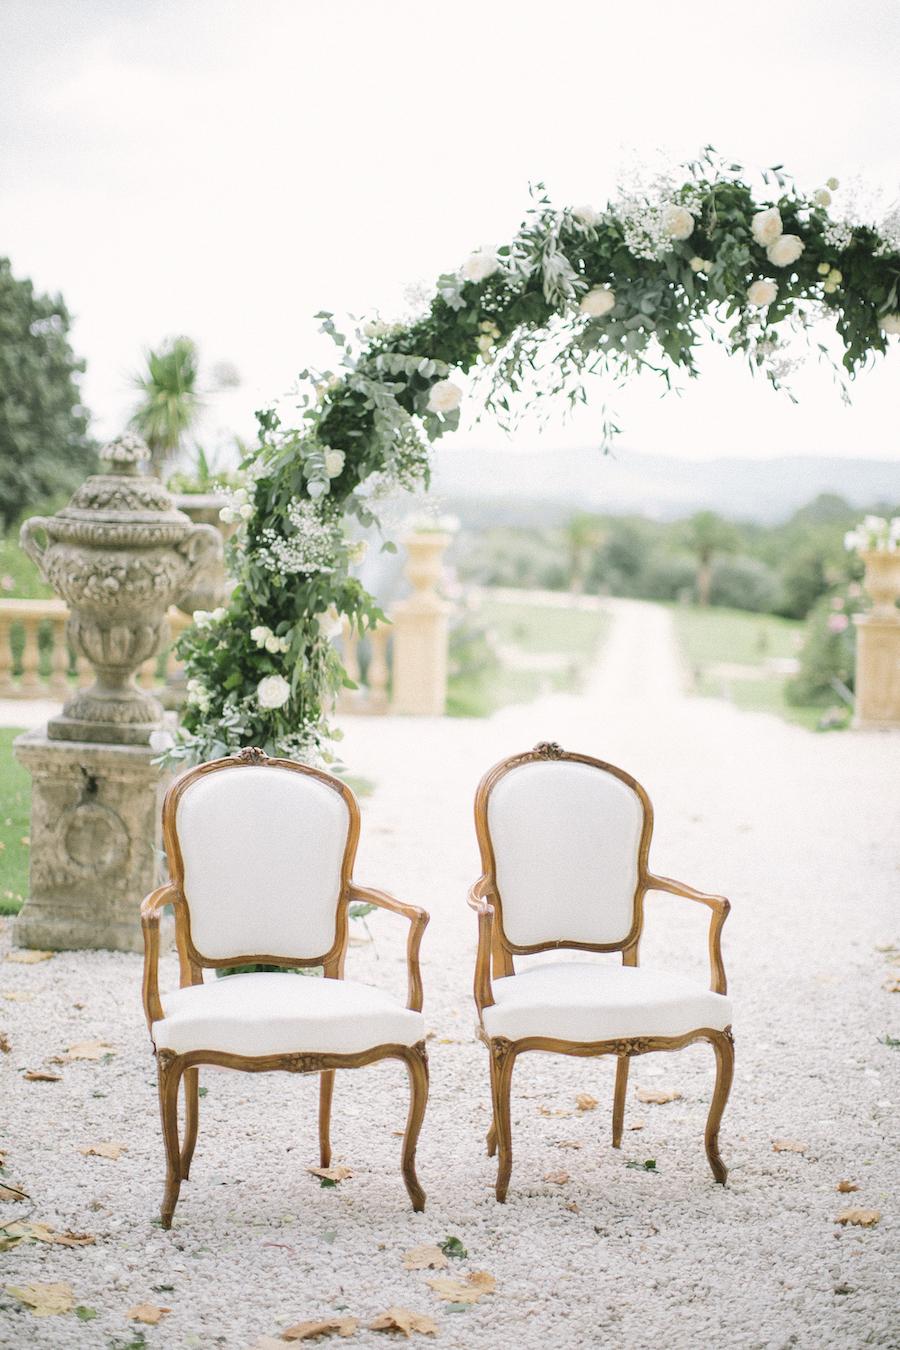 saya-photography-wedding-photographer-provence-chateau-de-robernier-38.jpg